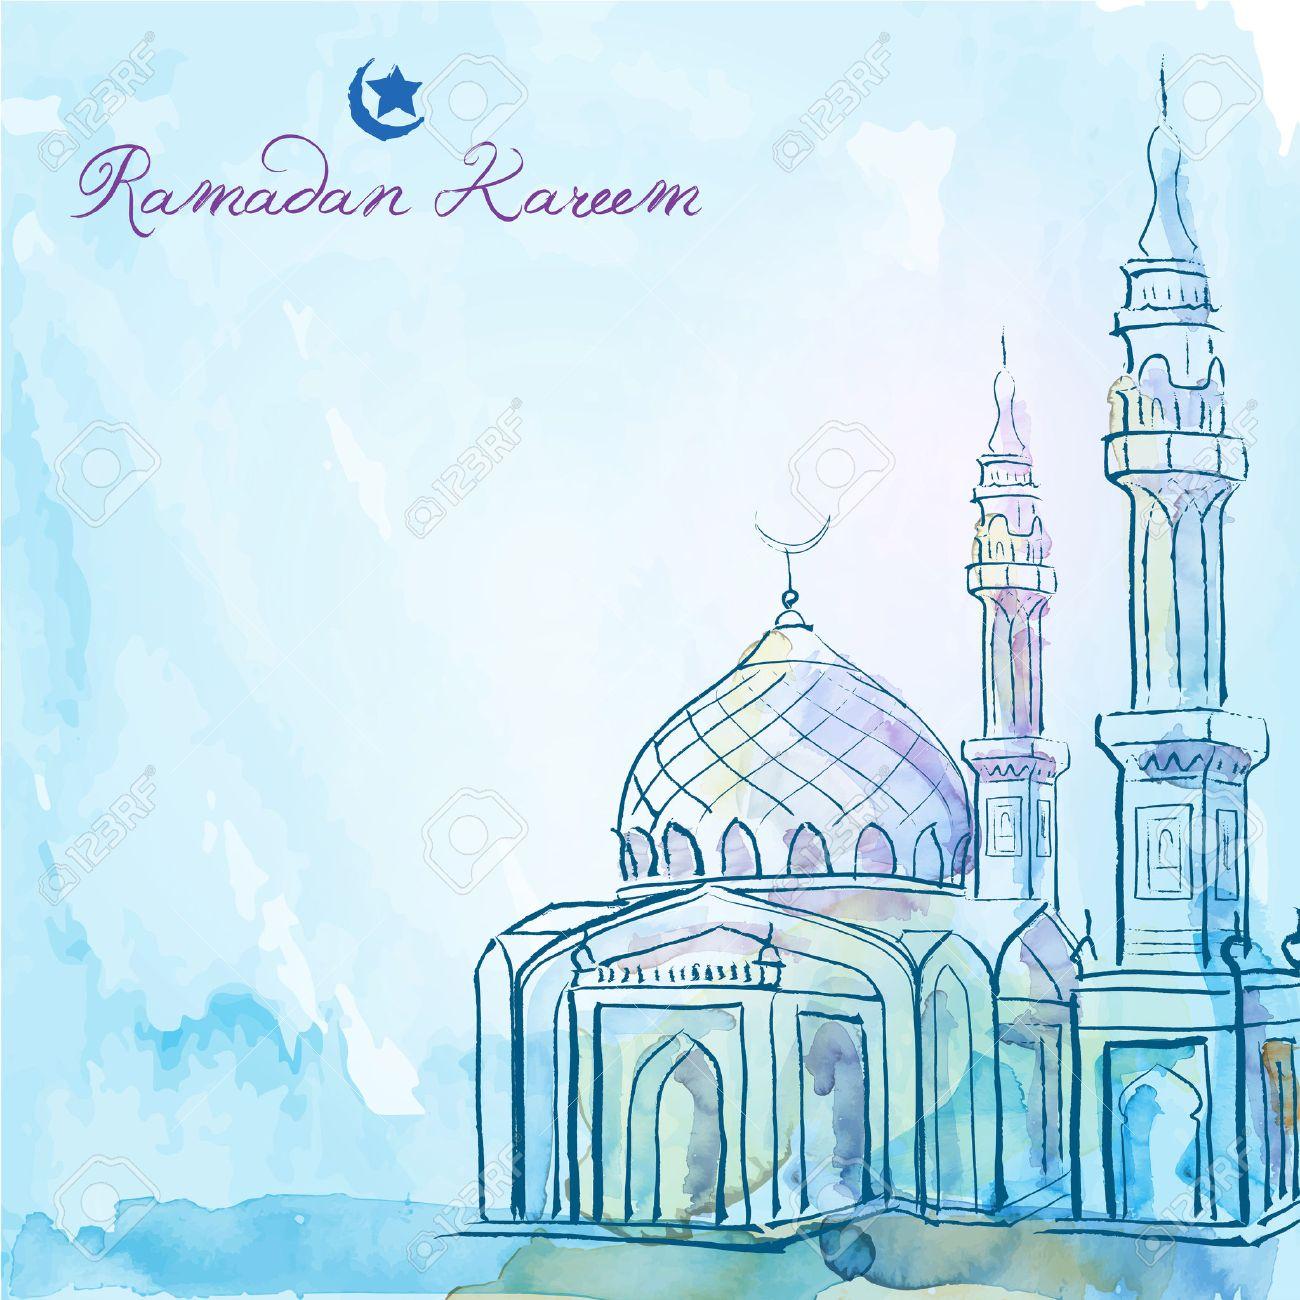 Mosque background for ramadan kareem stock photography image - Ramadan Kareem Greeting Background Mosque Watercolor Sketch Stock Vector 57004379